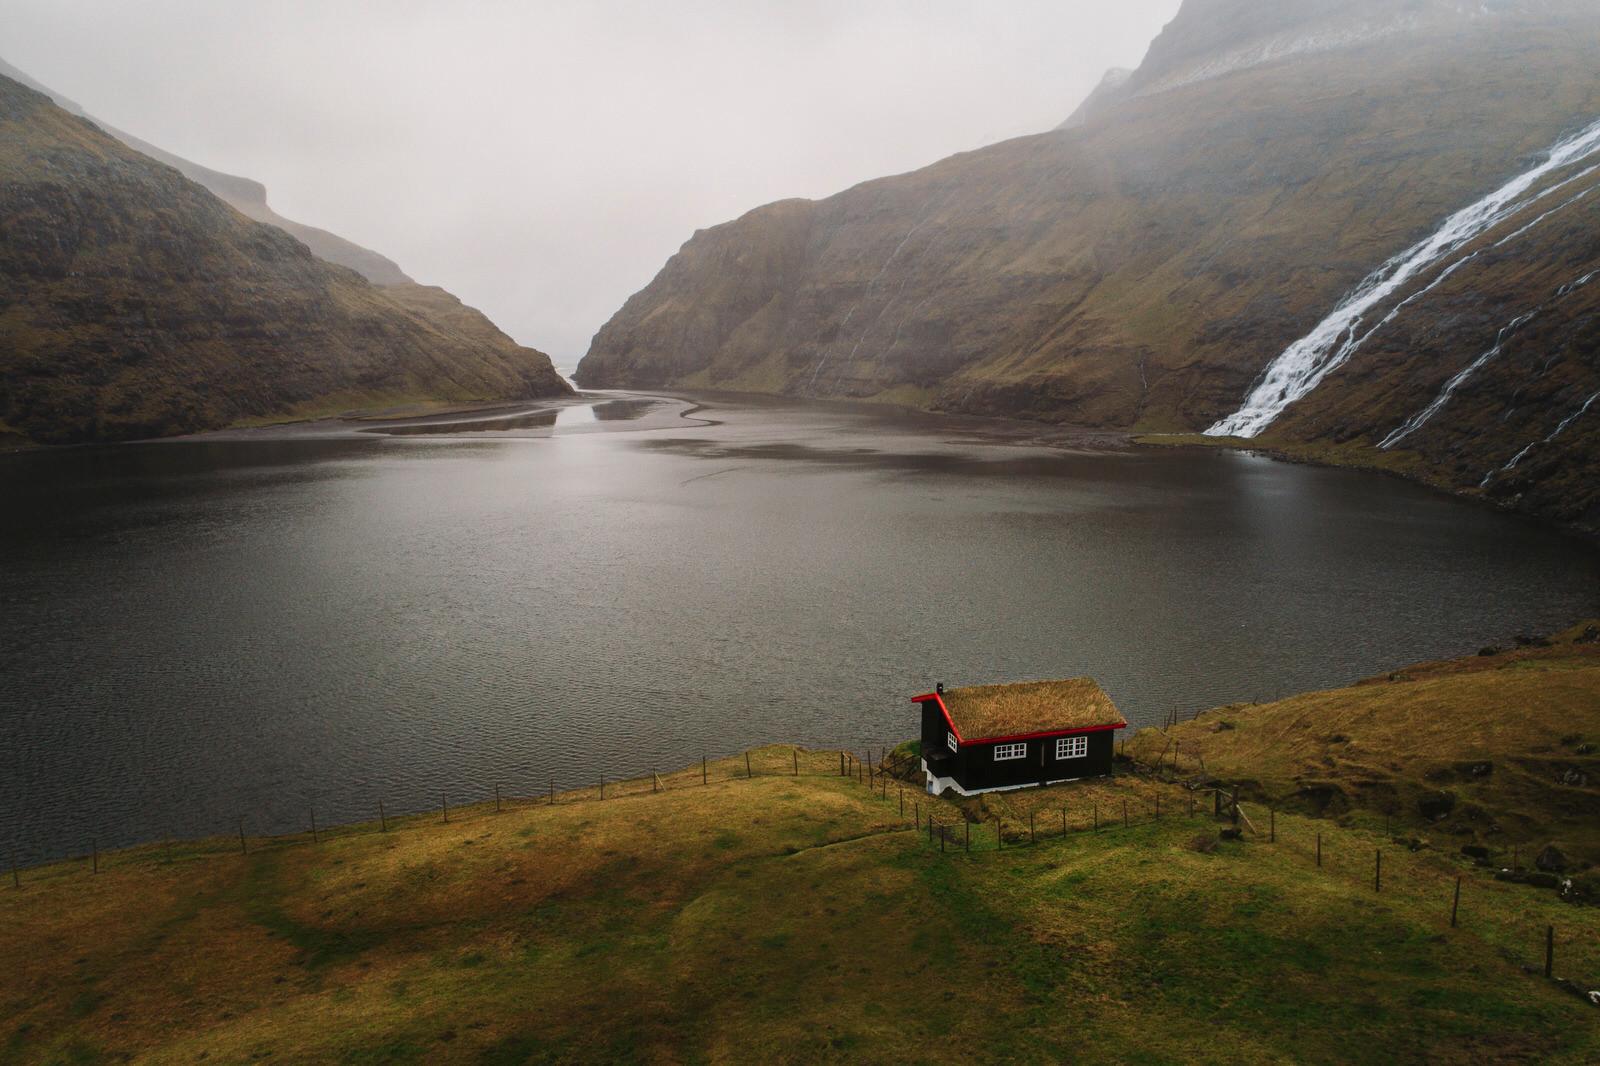 viaggio isole faroe_50.jpg